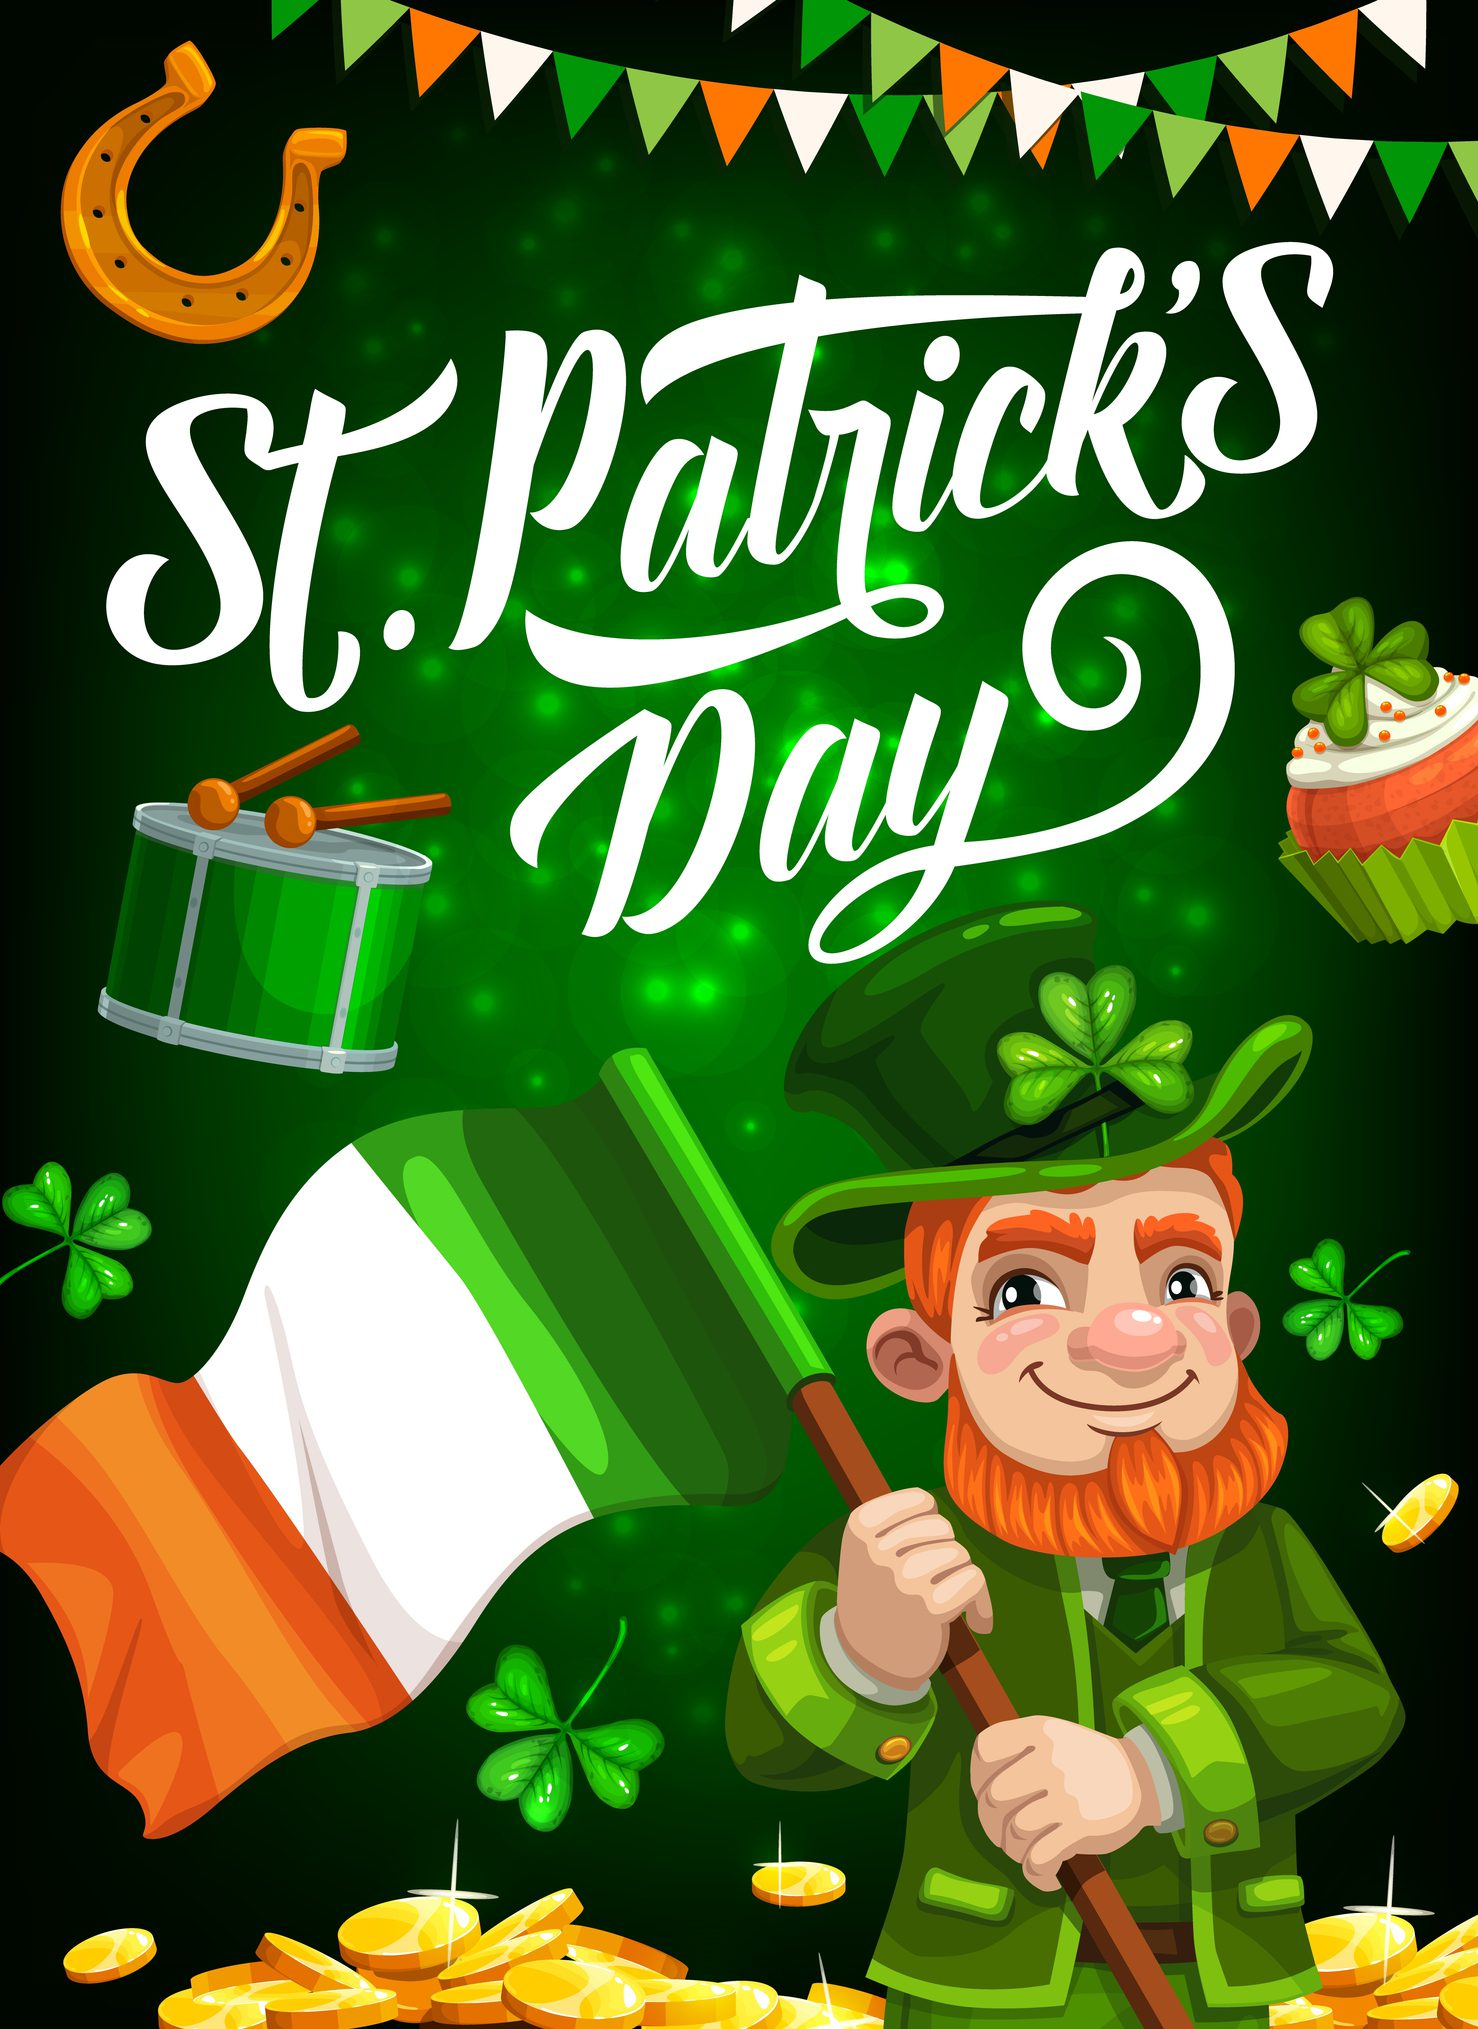 St Patricks Day holiday irishman with Ireland flag